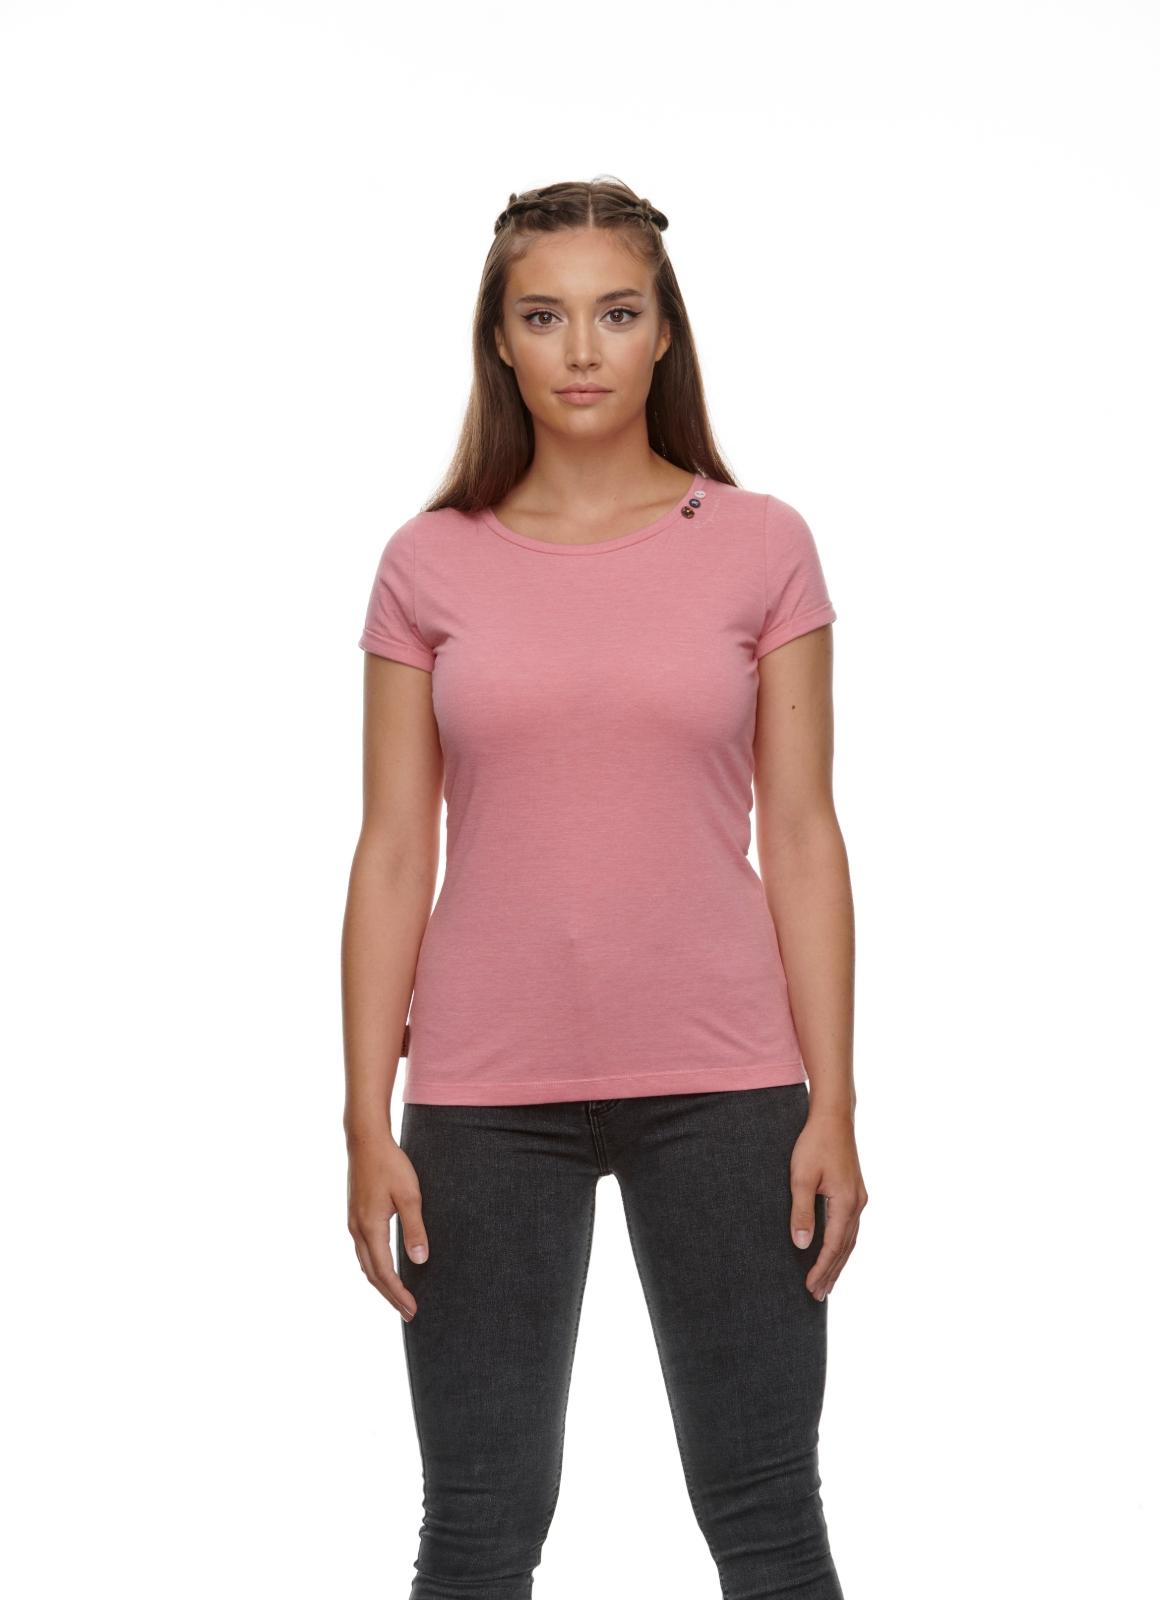 Ragwear Damen T-Shirt Florah a Organic rosa unifarben 2111 10049 4043 pink